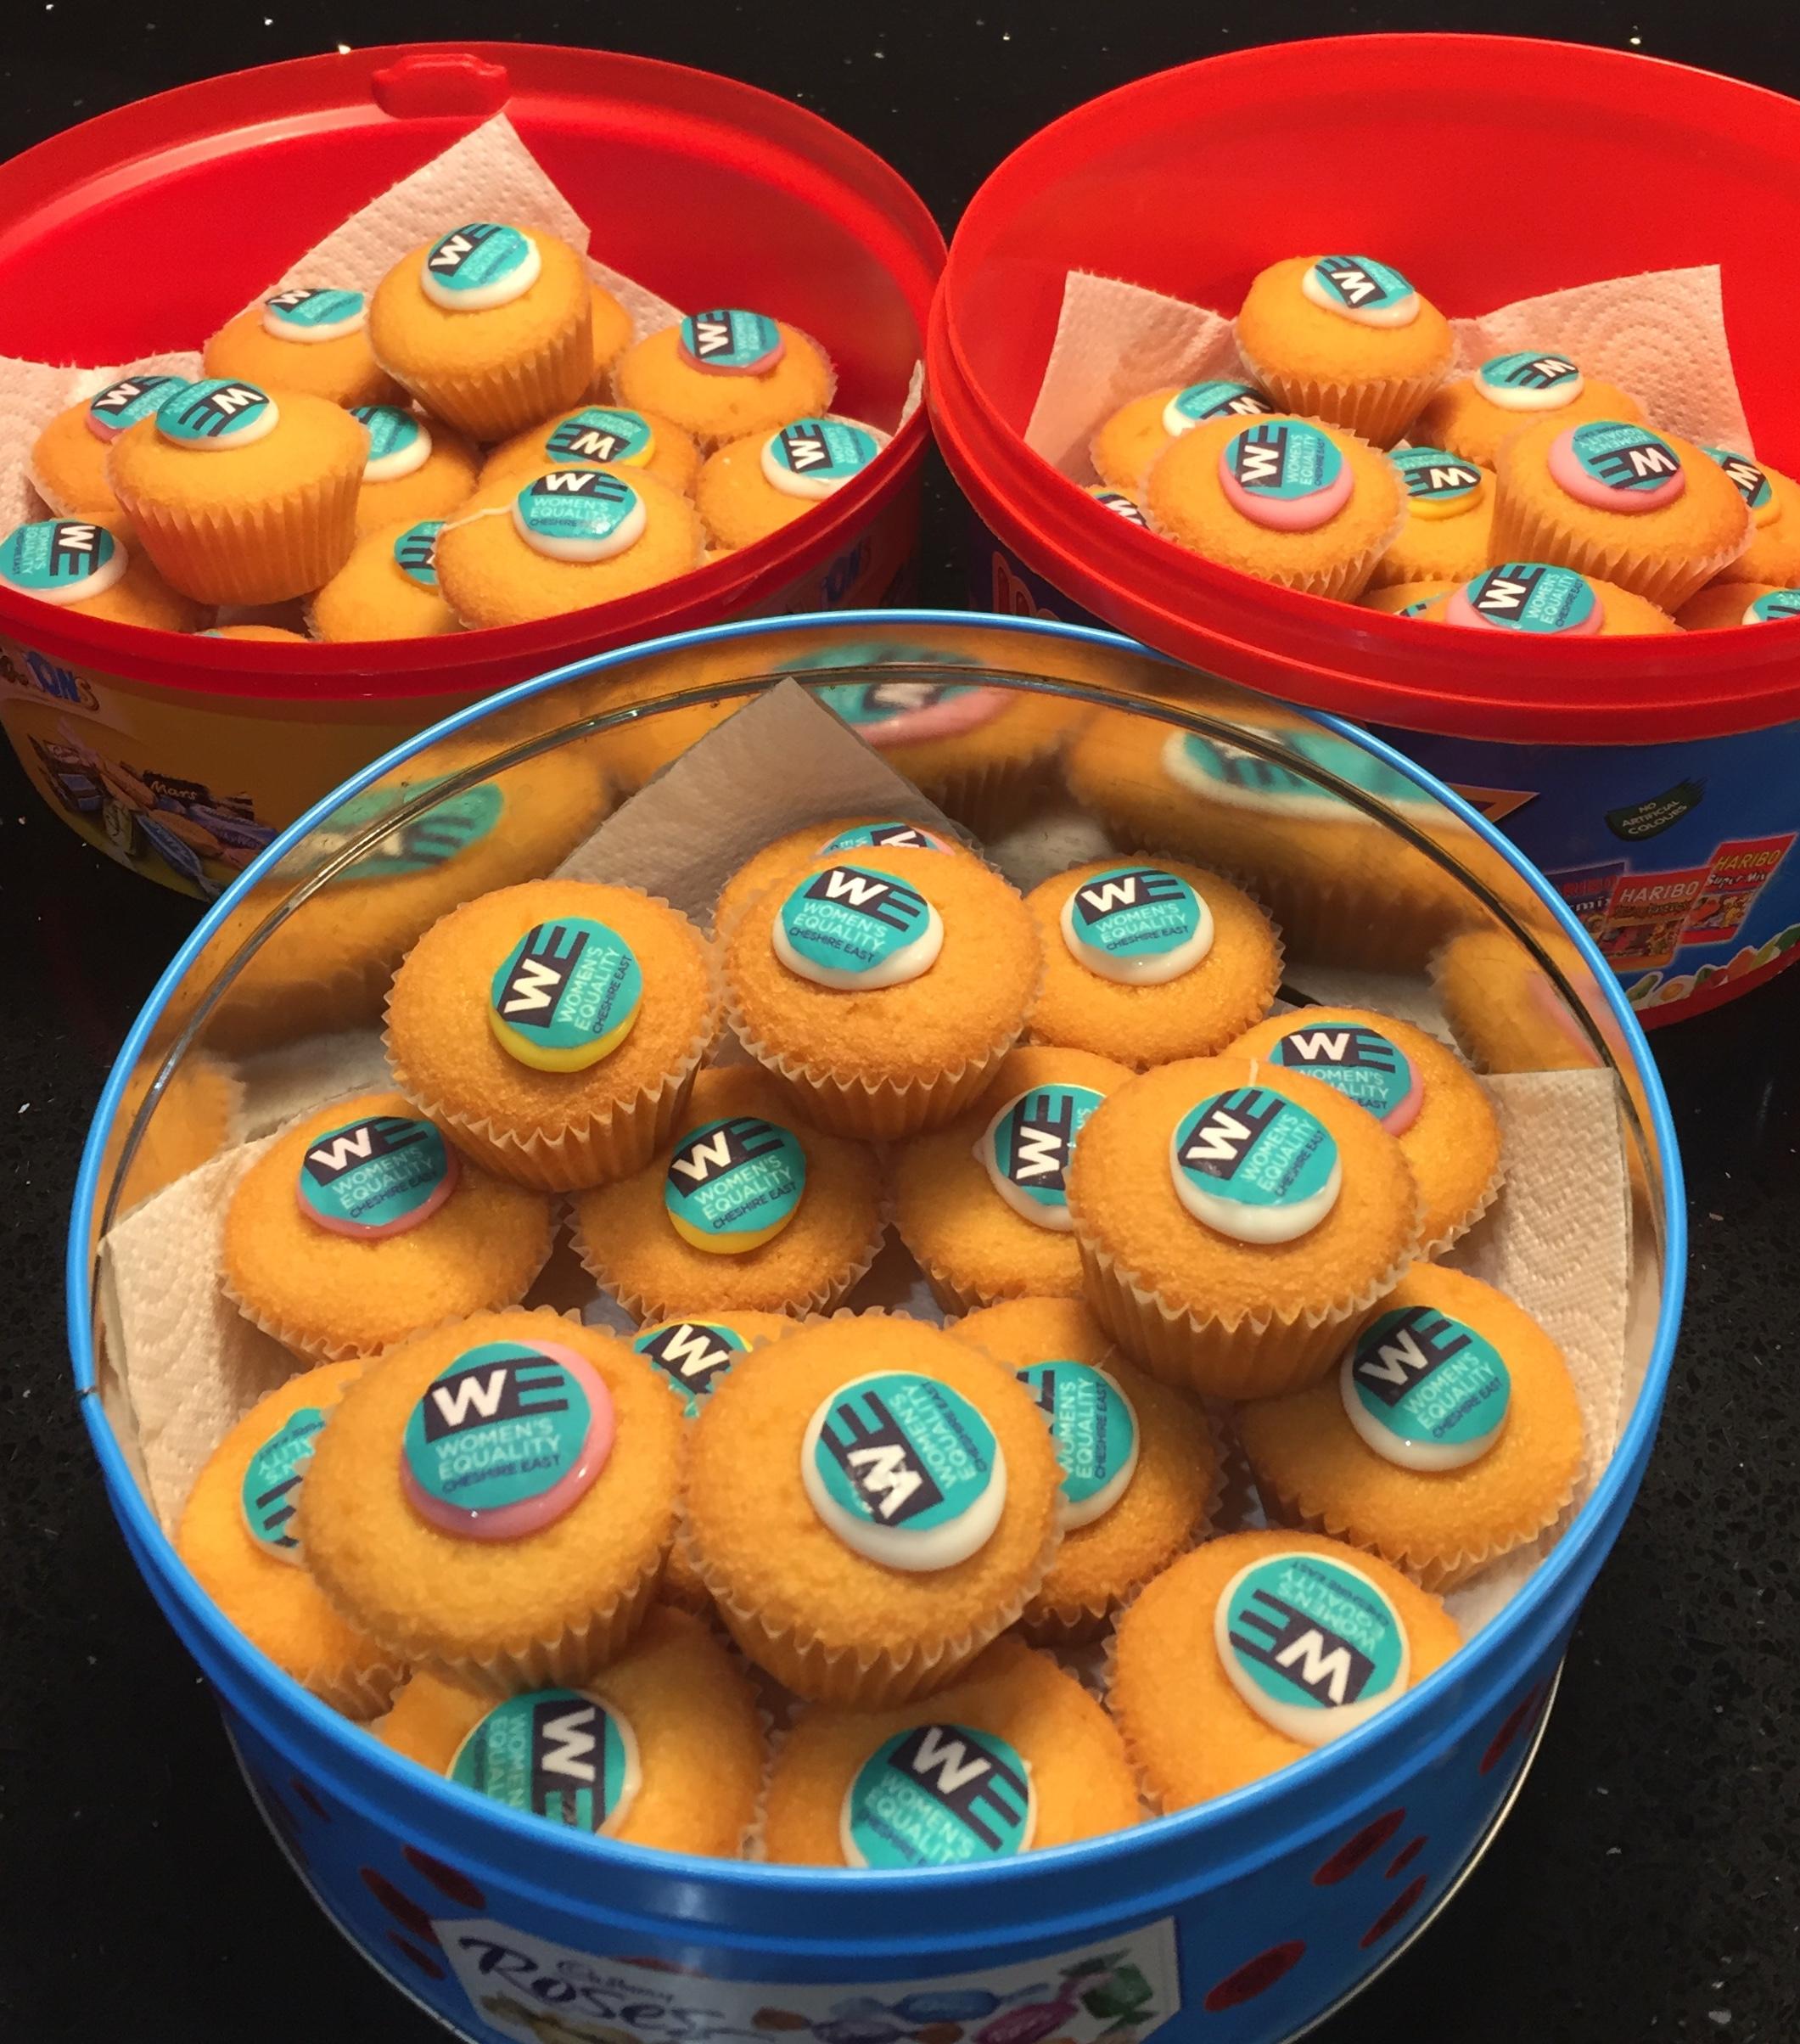 Sponge cakes with WE logo